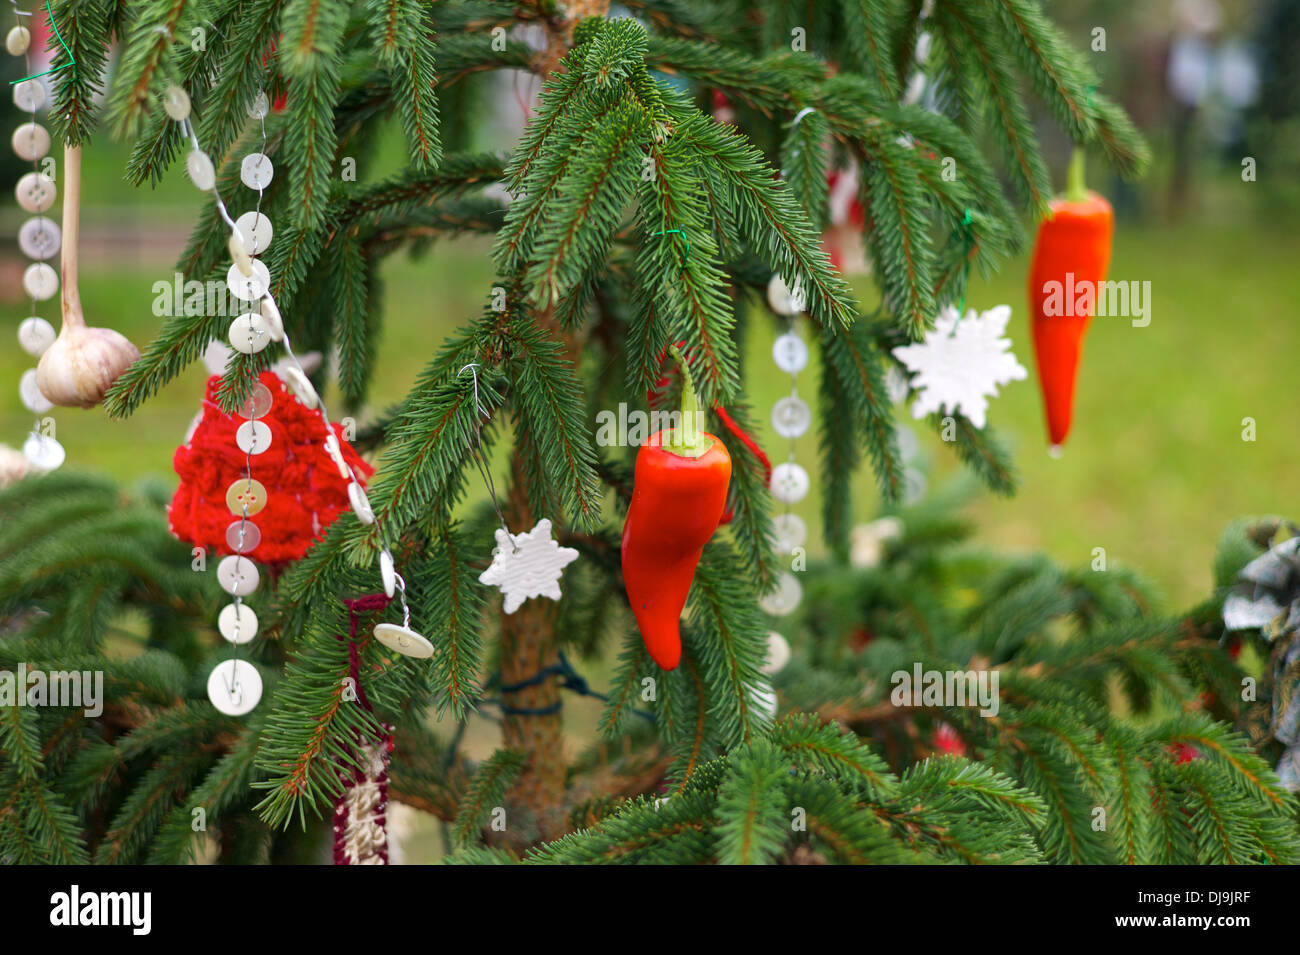 Home Made Christmas Tree Decorations Uk Stock Photo